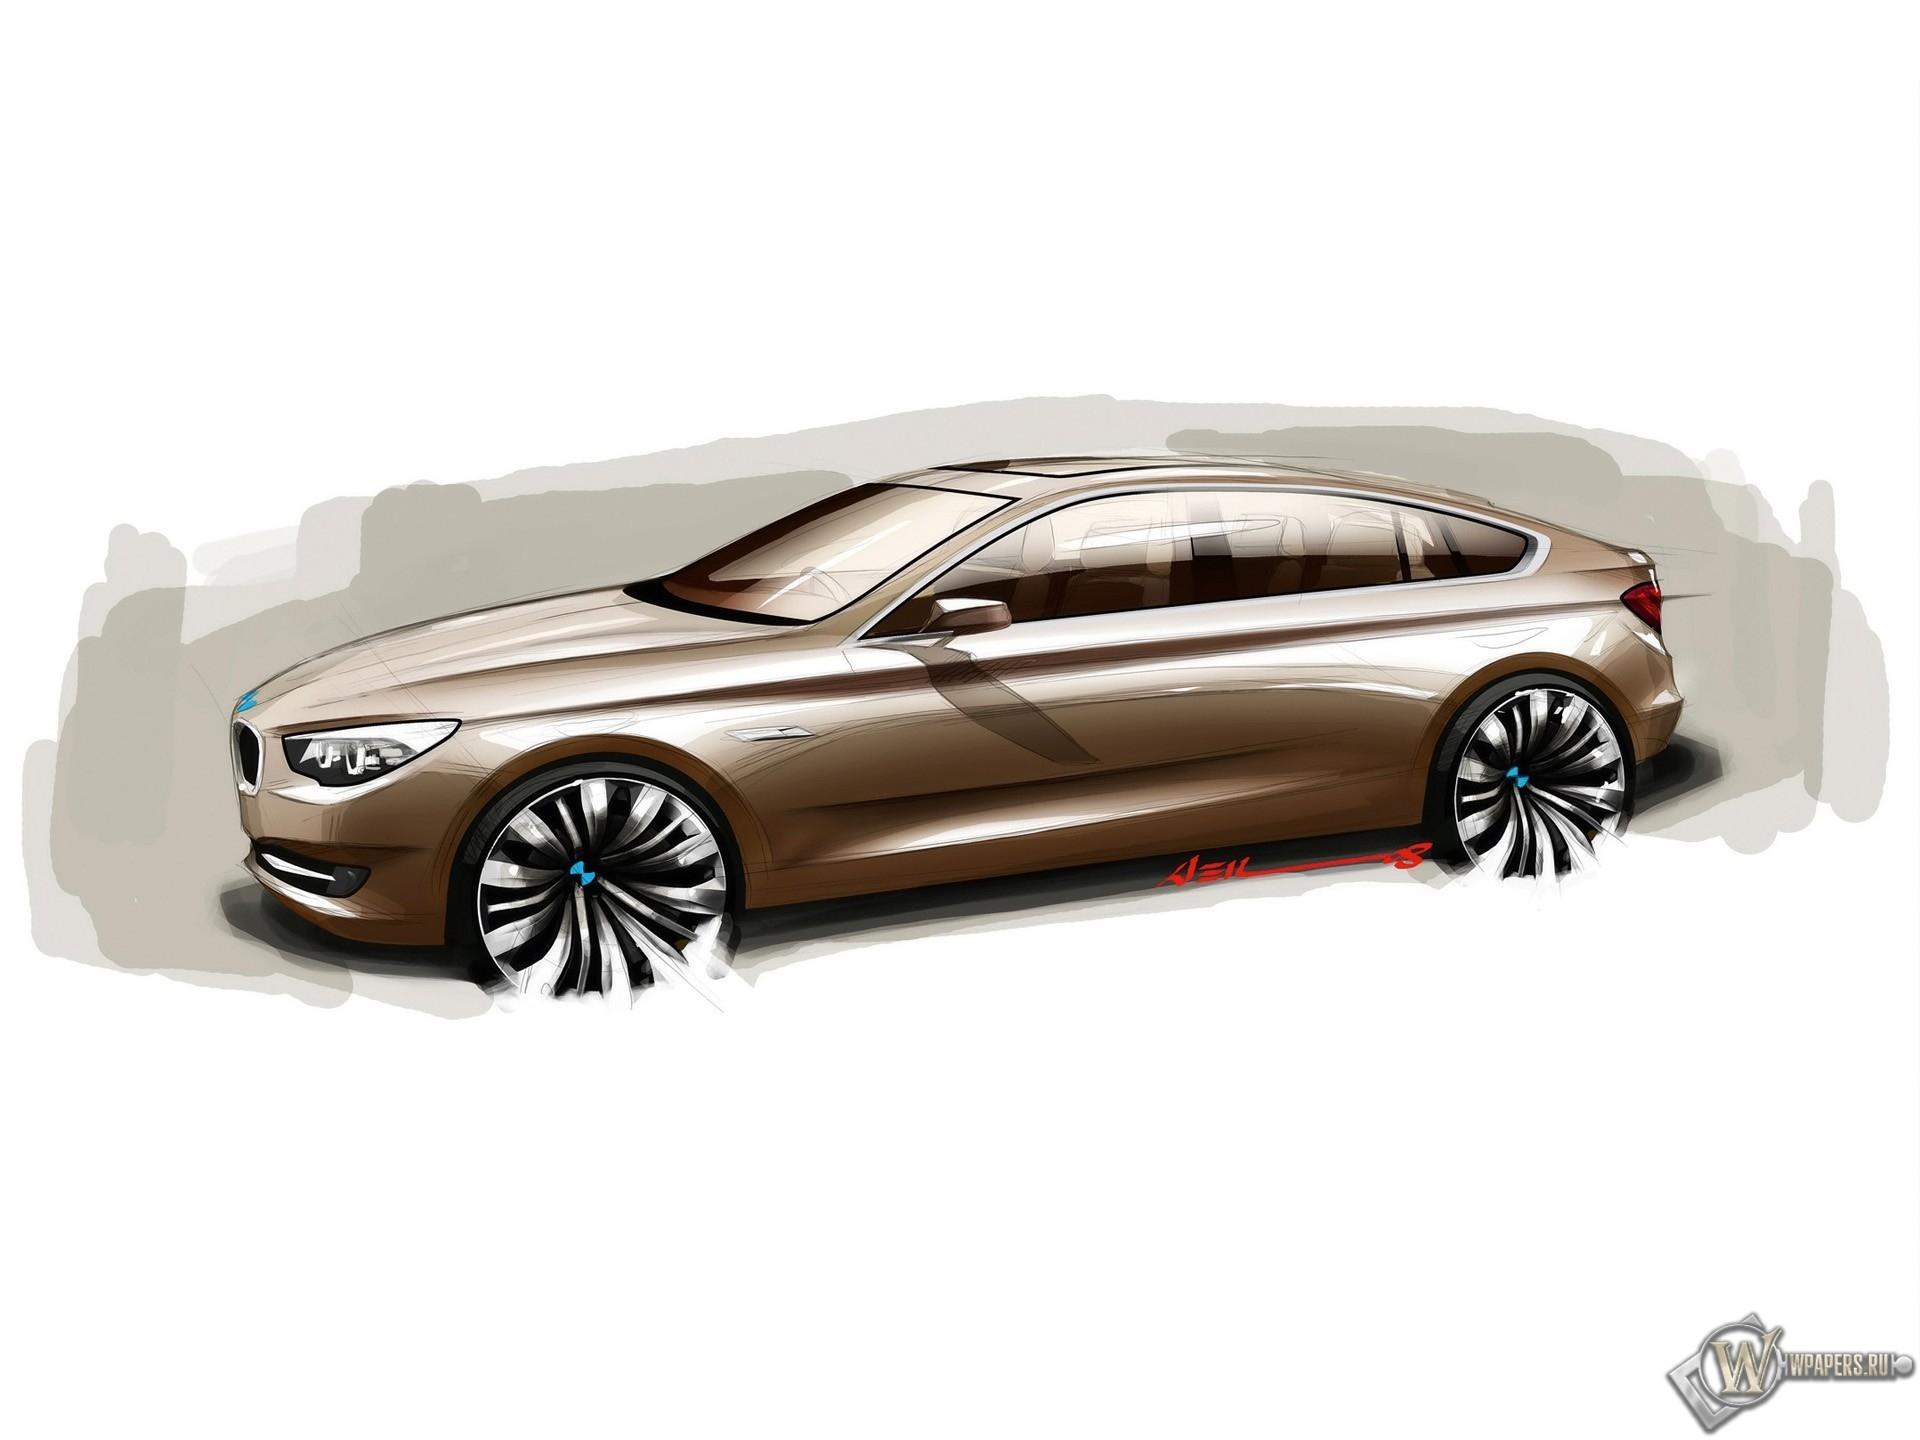 BMW Concept 5 Series Gran Turismo 1920x1440